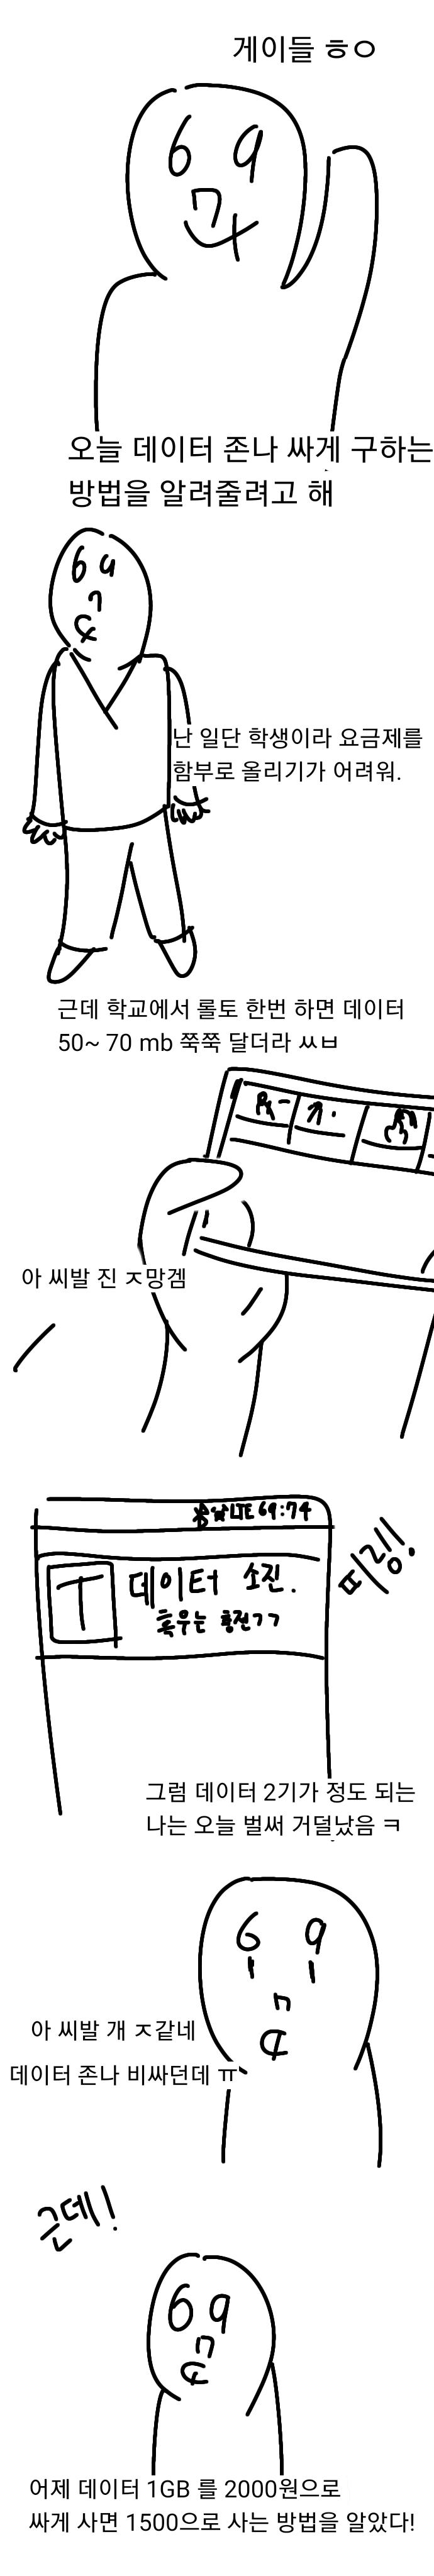 viewimage.php?no=24b0d769e1d32ca73fed8ffa11d028317805b44c4c832ef9bd9f21ca3c33a89df7265a5e0d8059c98728100ef1bb5ebd4bdf8c859d7b241d12e5b34f67f69446aebeace9fcf530b4e15b442d0acae9fb122a75bf312270be6da569cd01